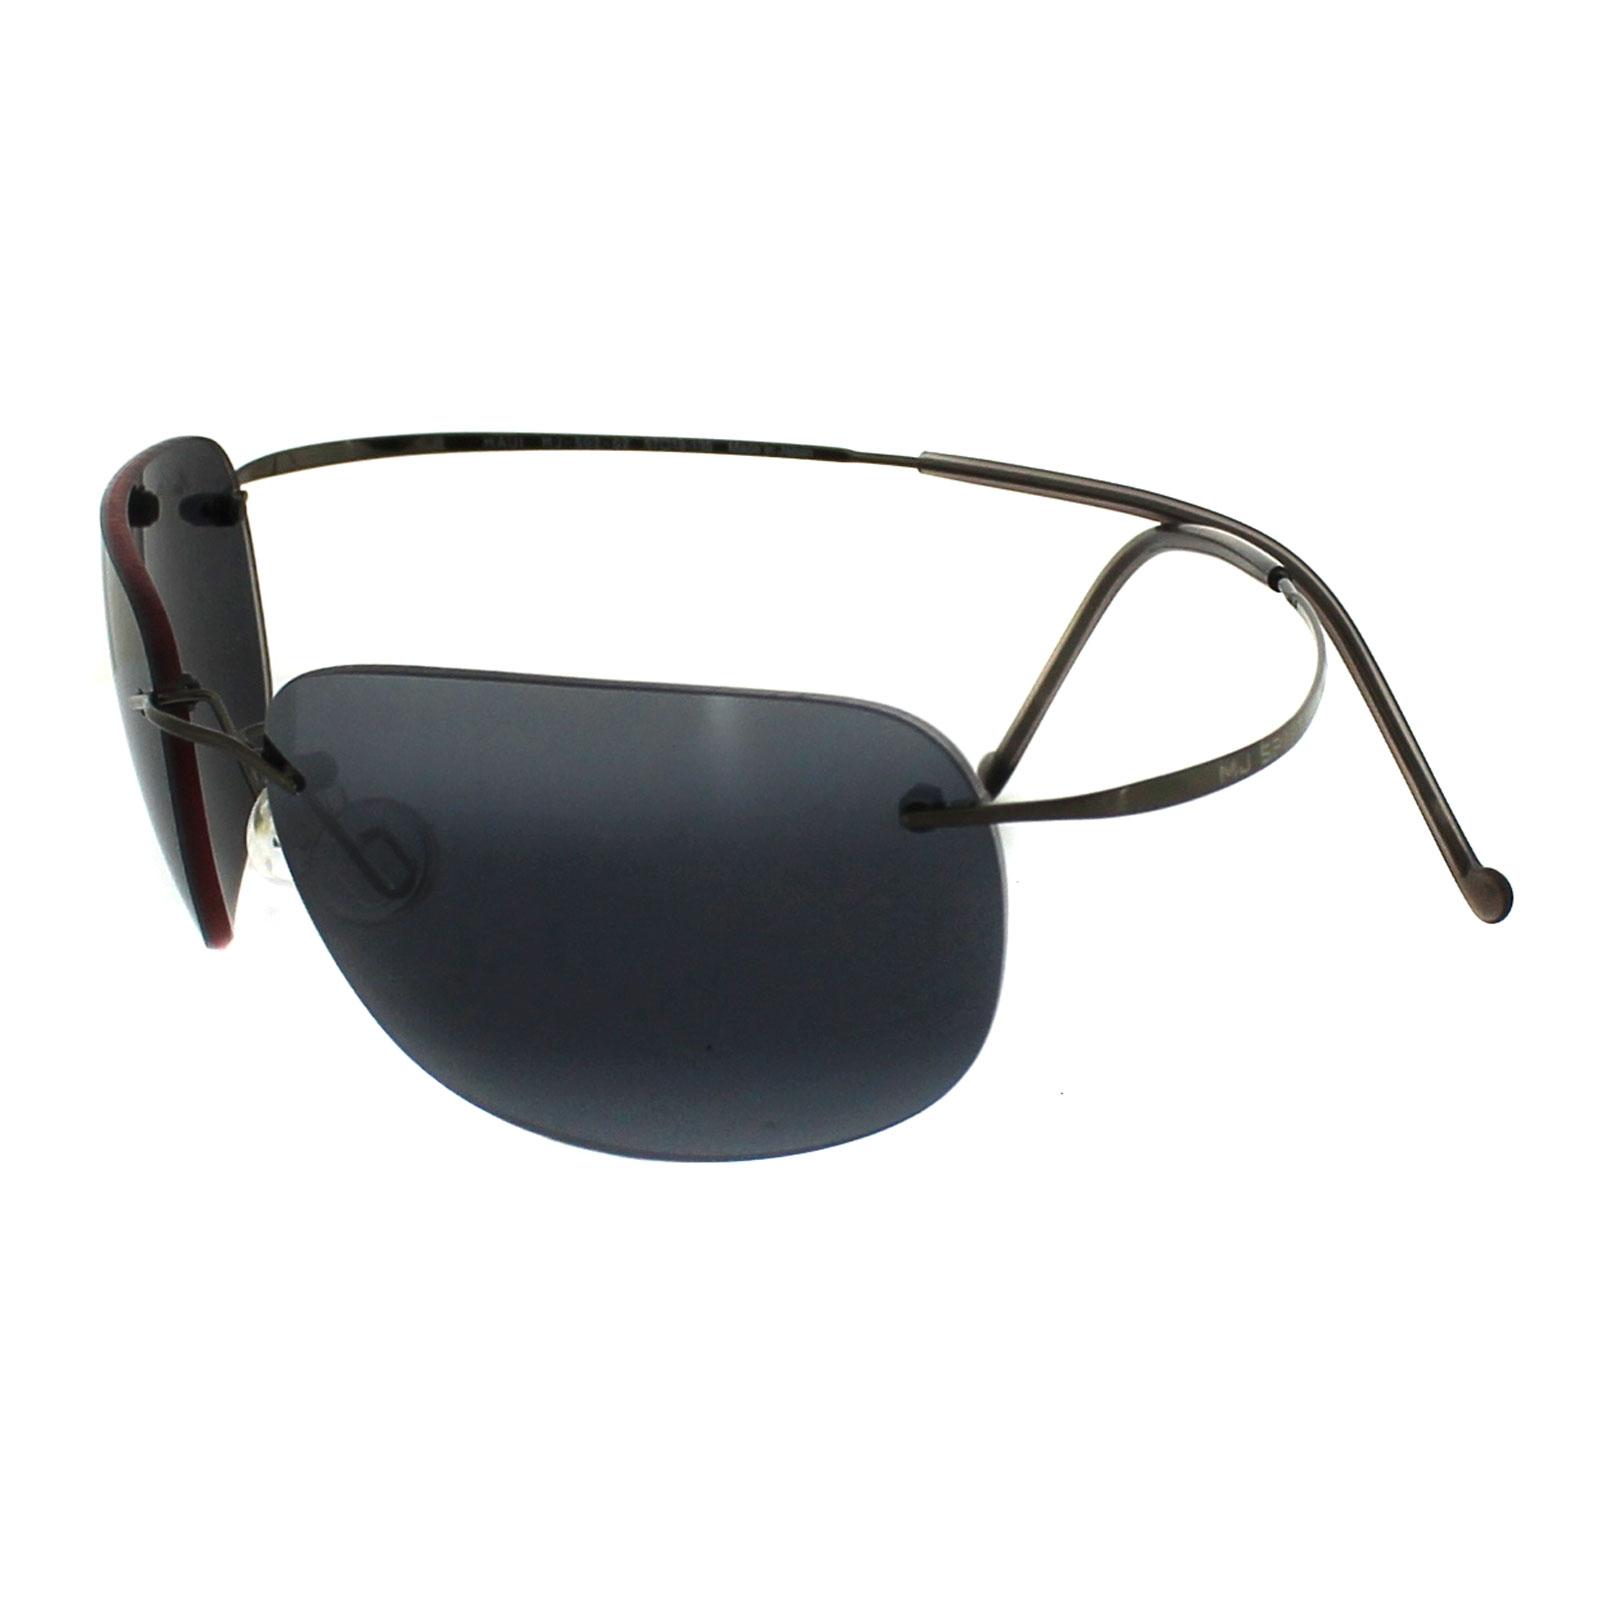 Maui jim canoes polarized sunglasses reviews for Maui jim fishing sunglasses